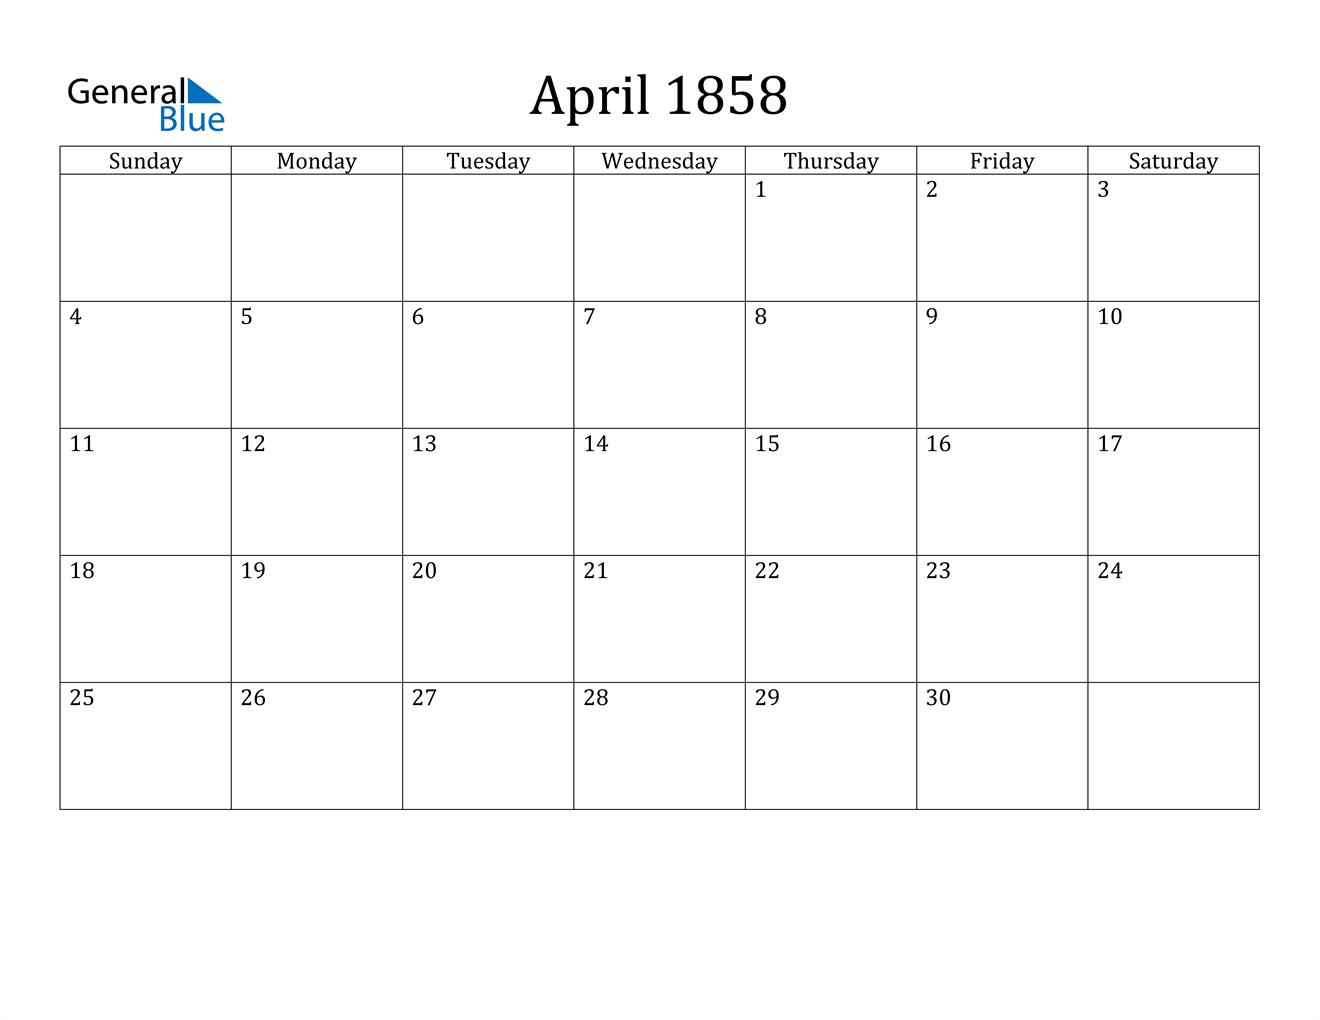 Image of April 1858 Calendar